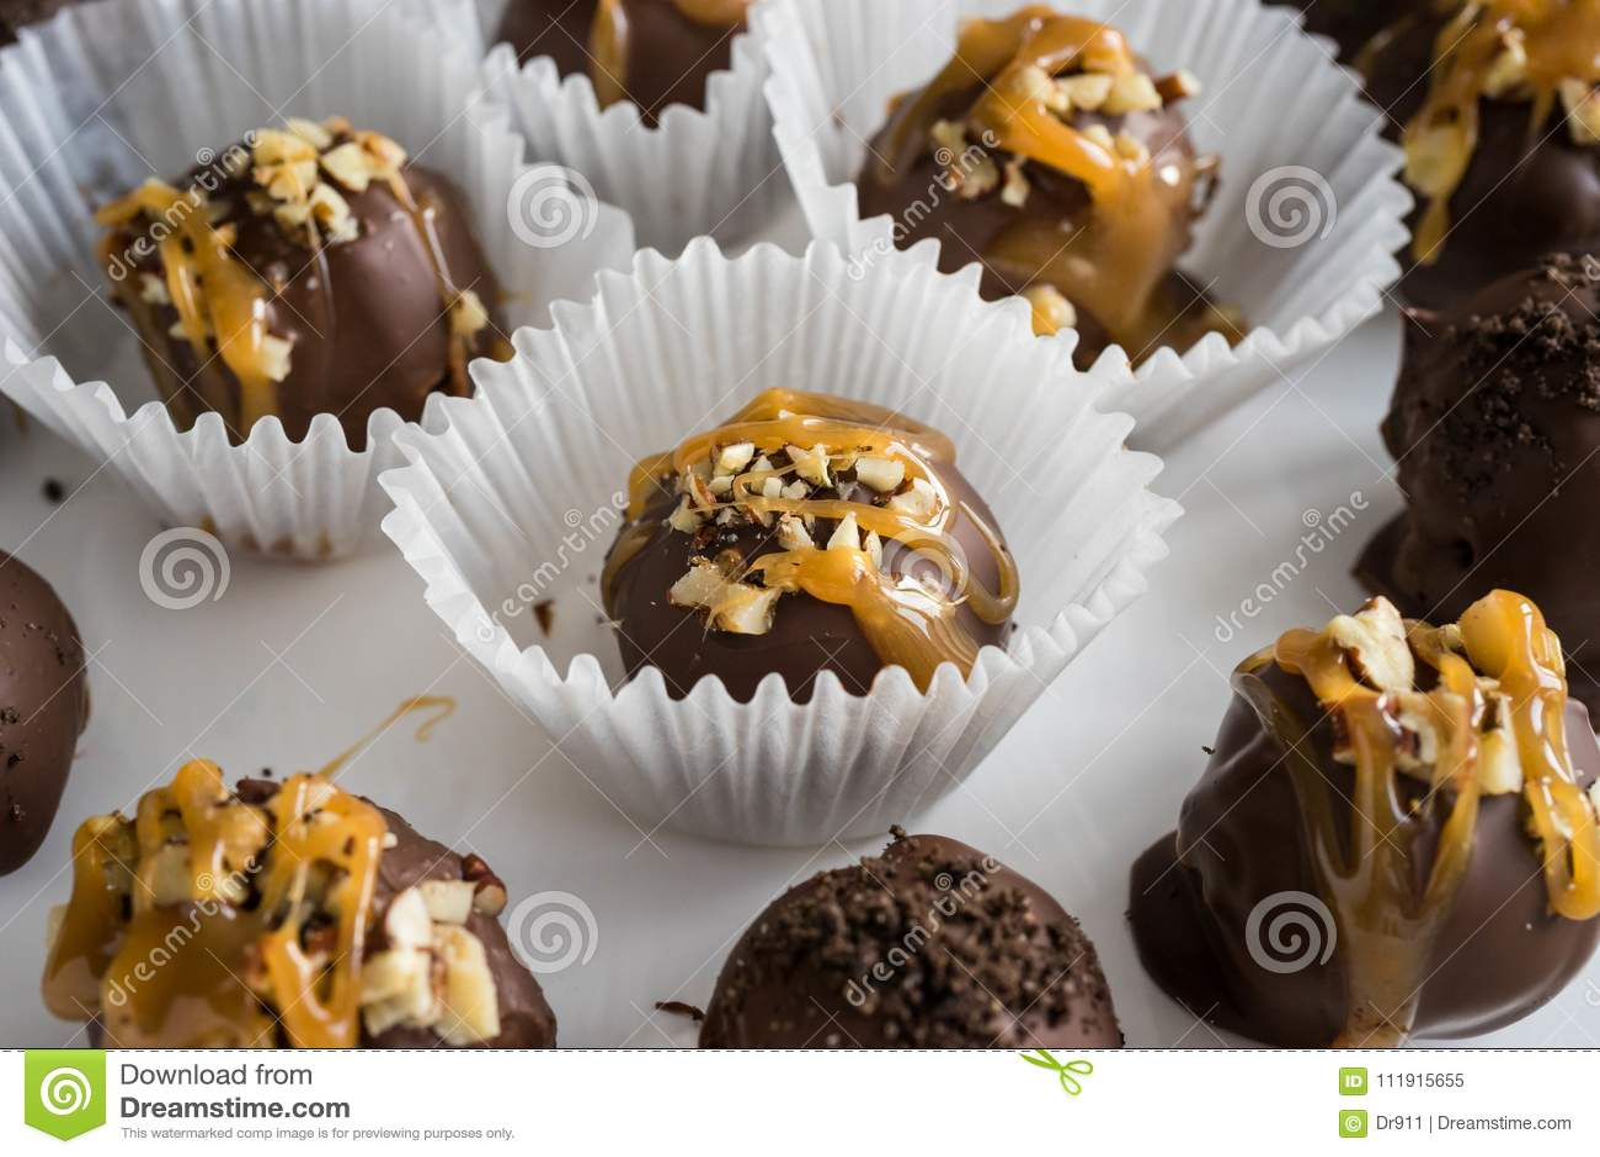 Homemade healthy chocolate truffles